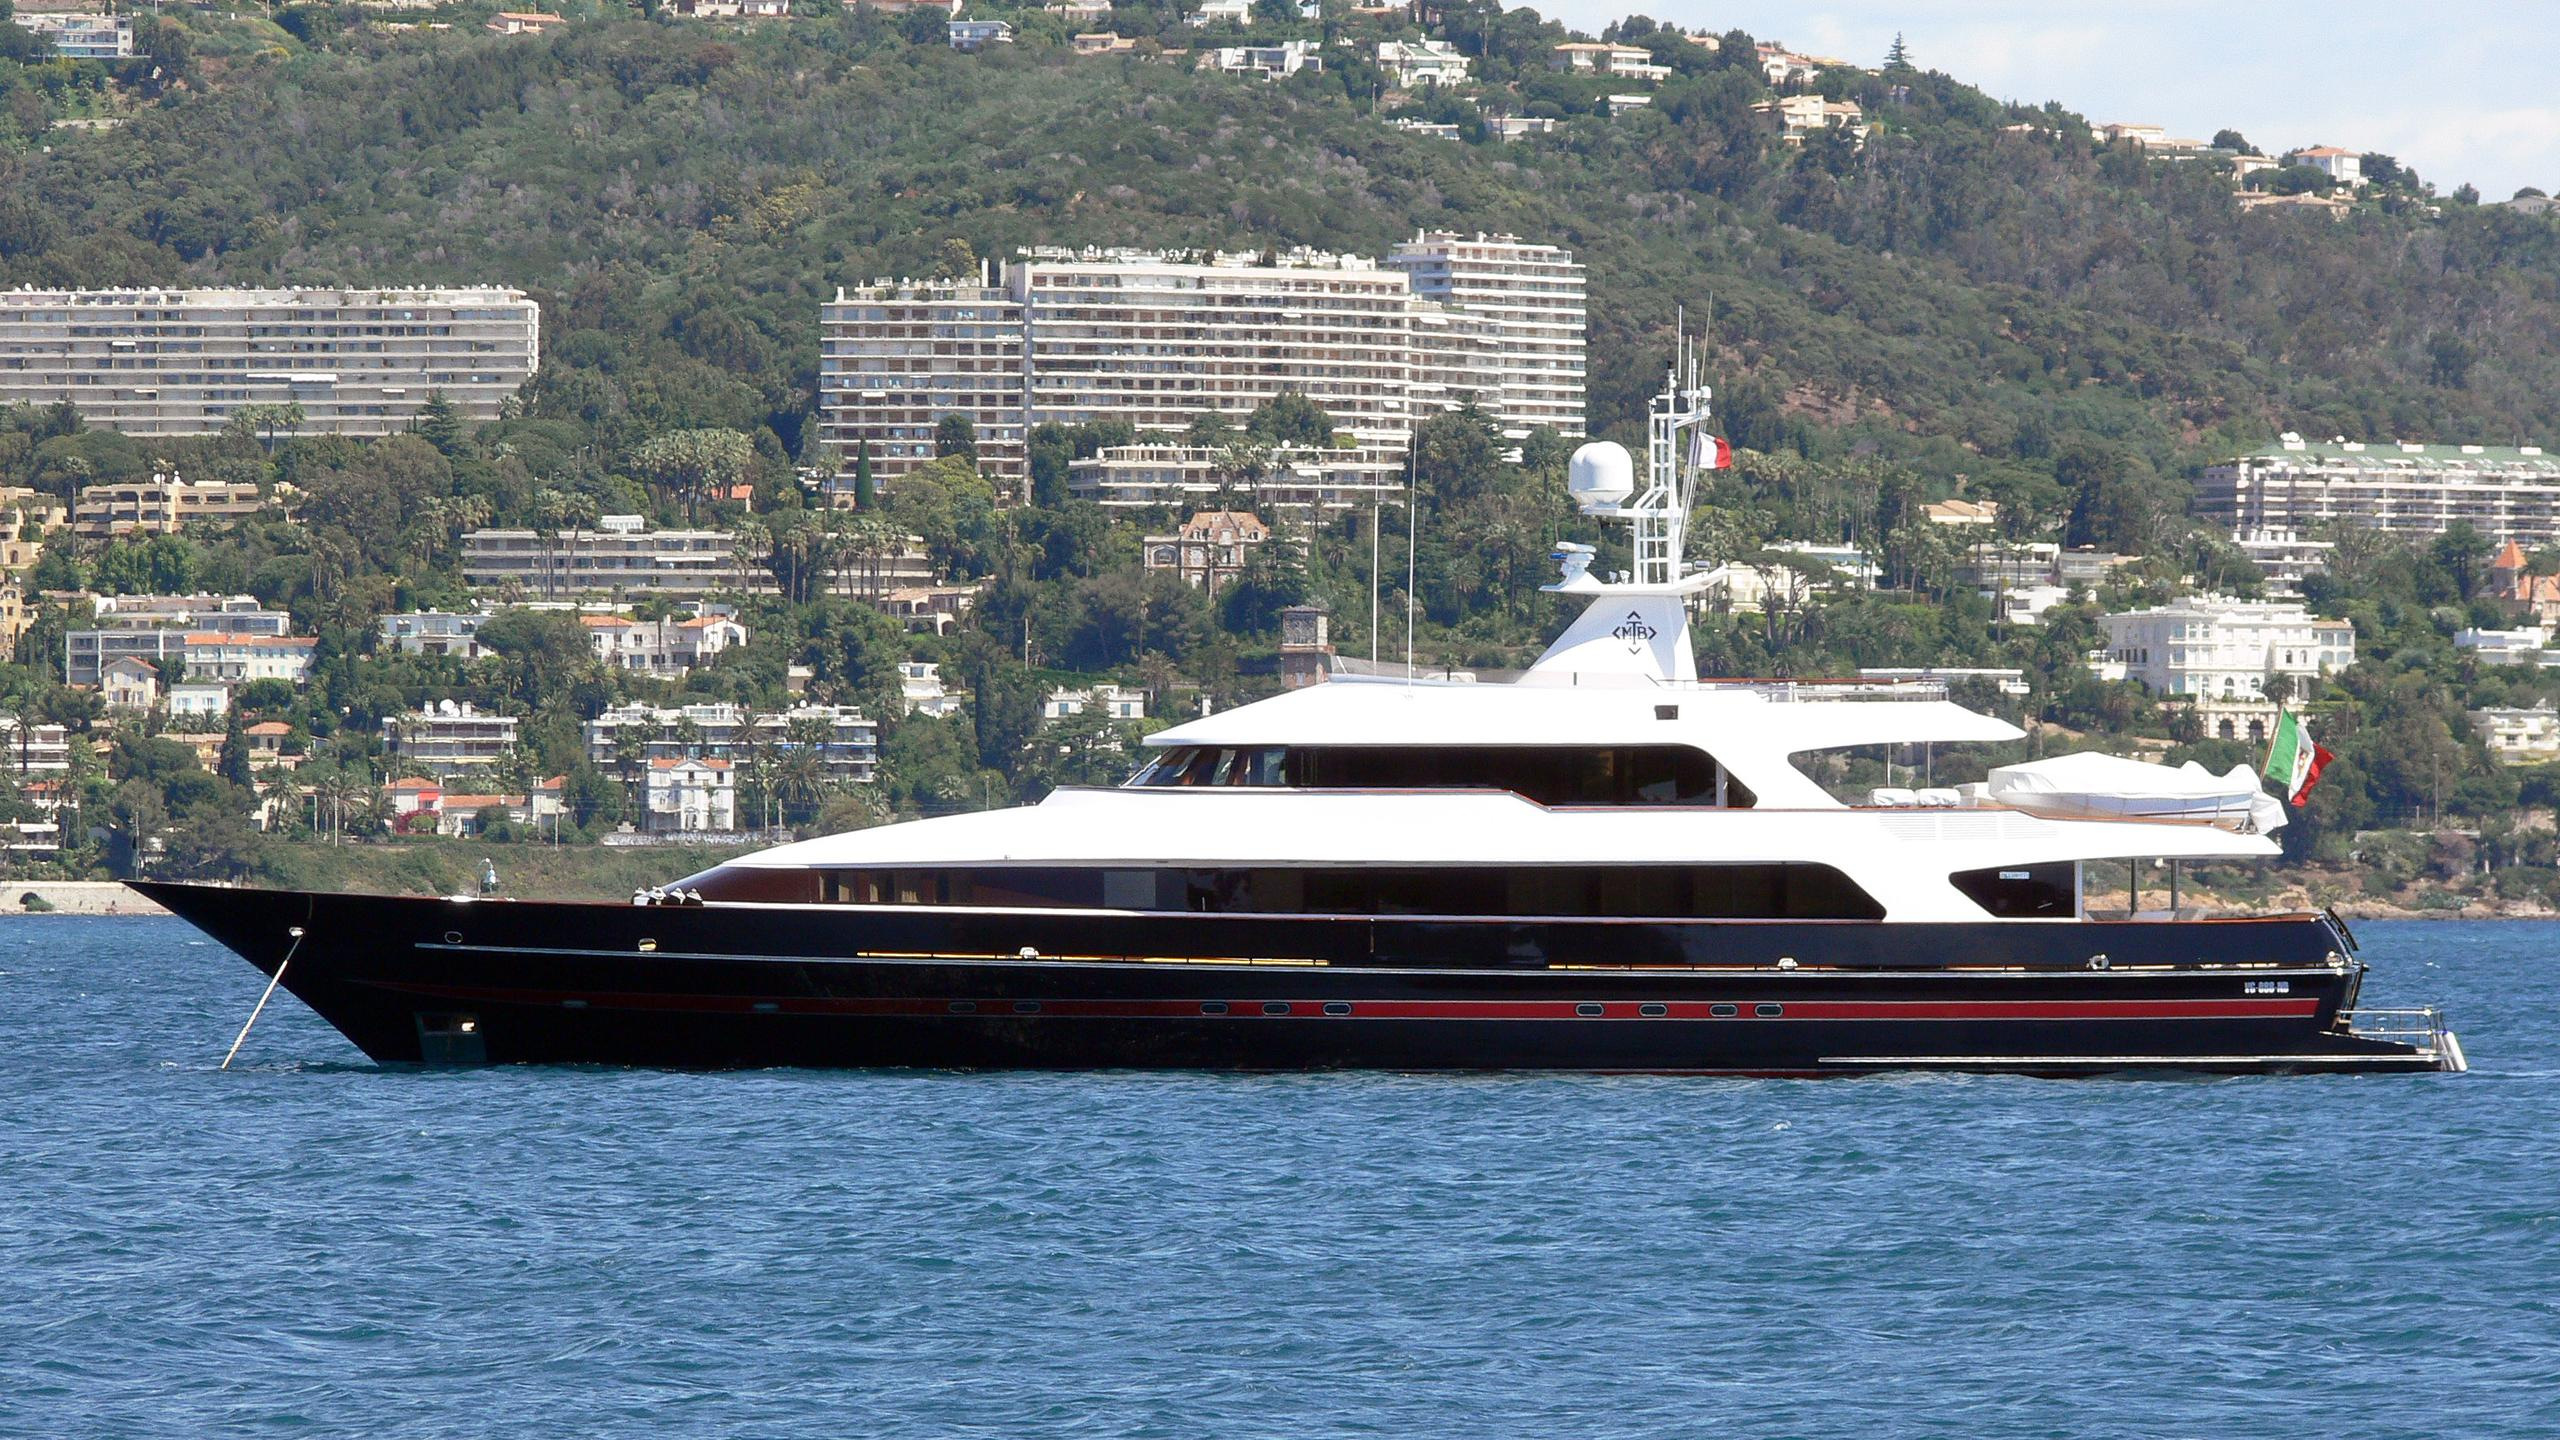 tm-blue-one-motor-yacht-picchiotti-1988-46m-anchored